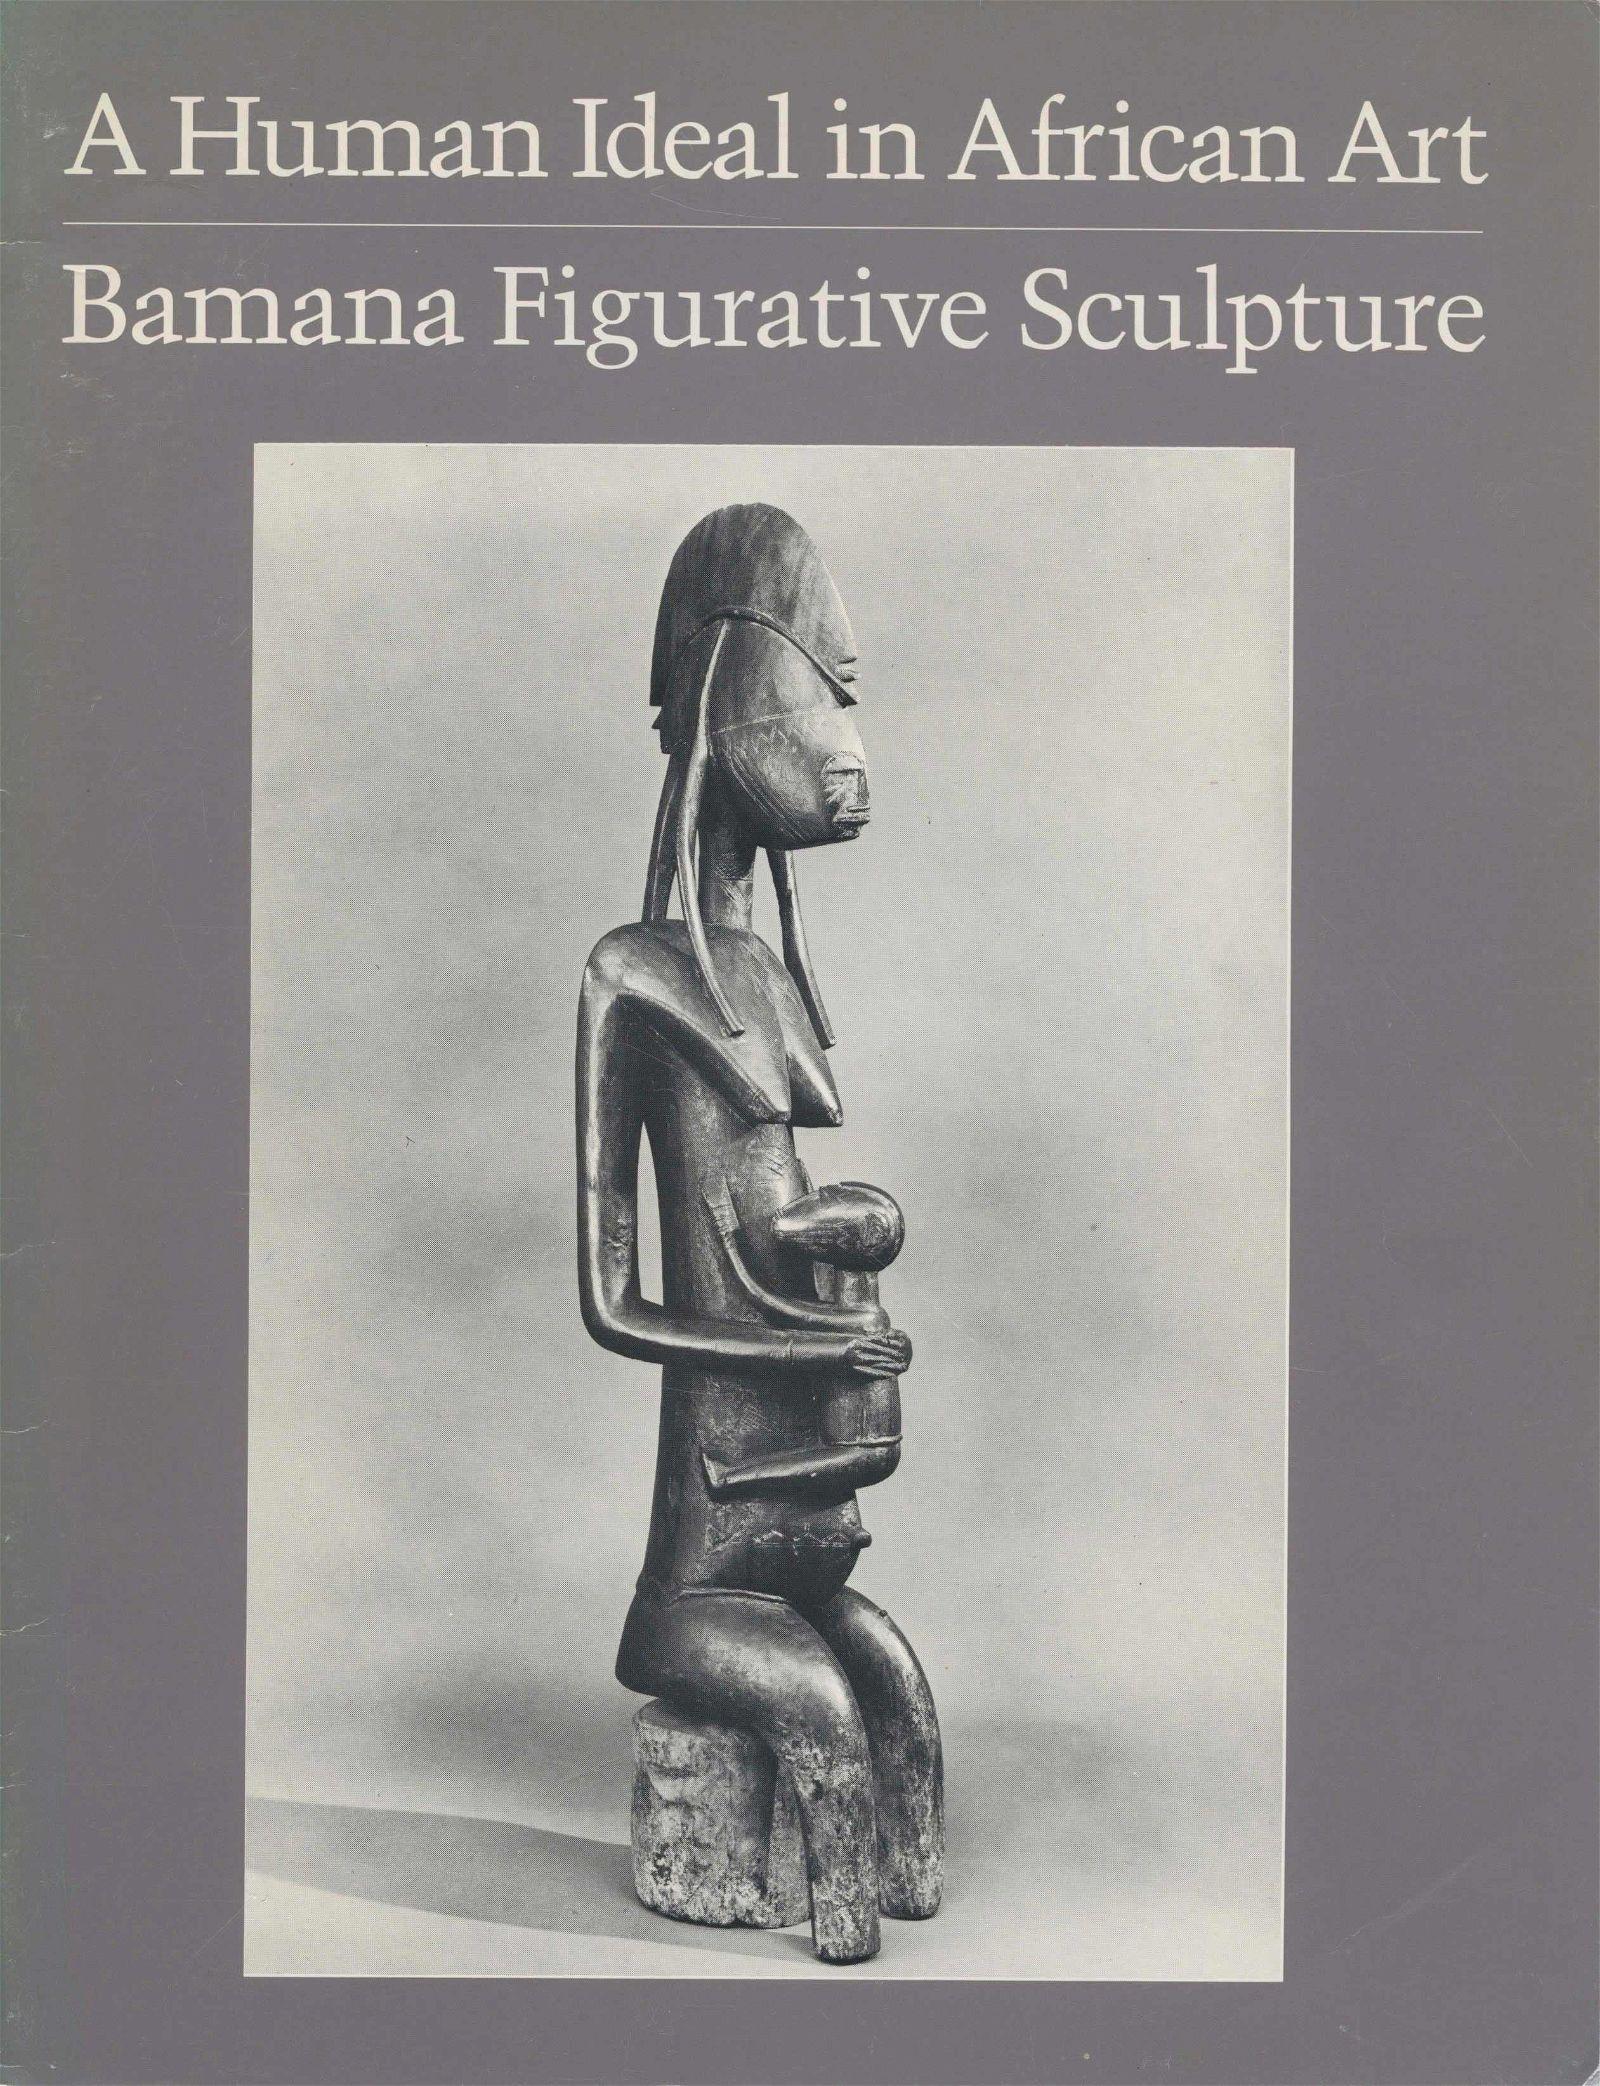 Bamana Figurative Sculpture